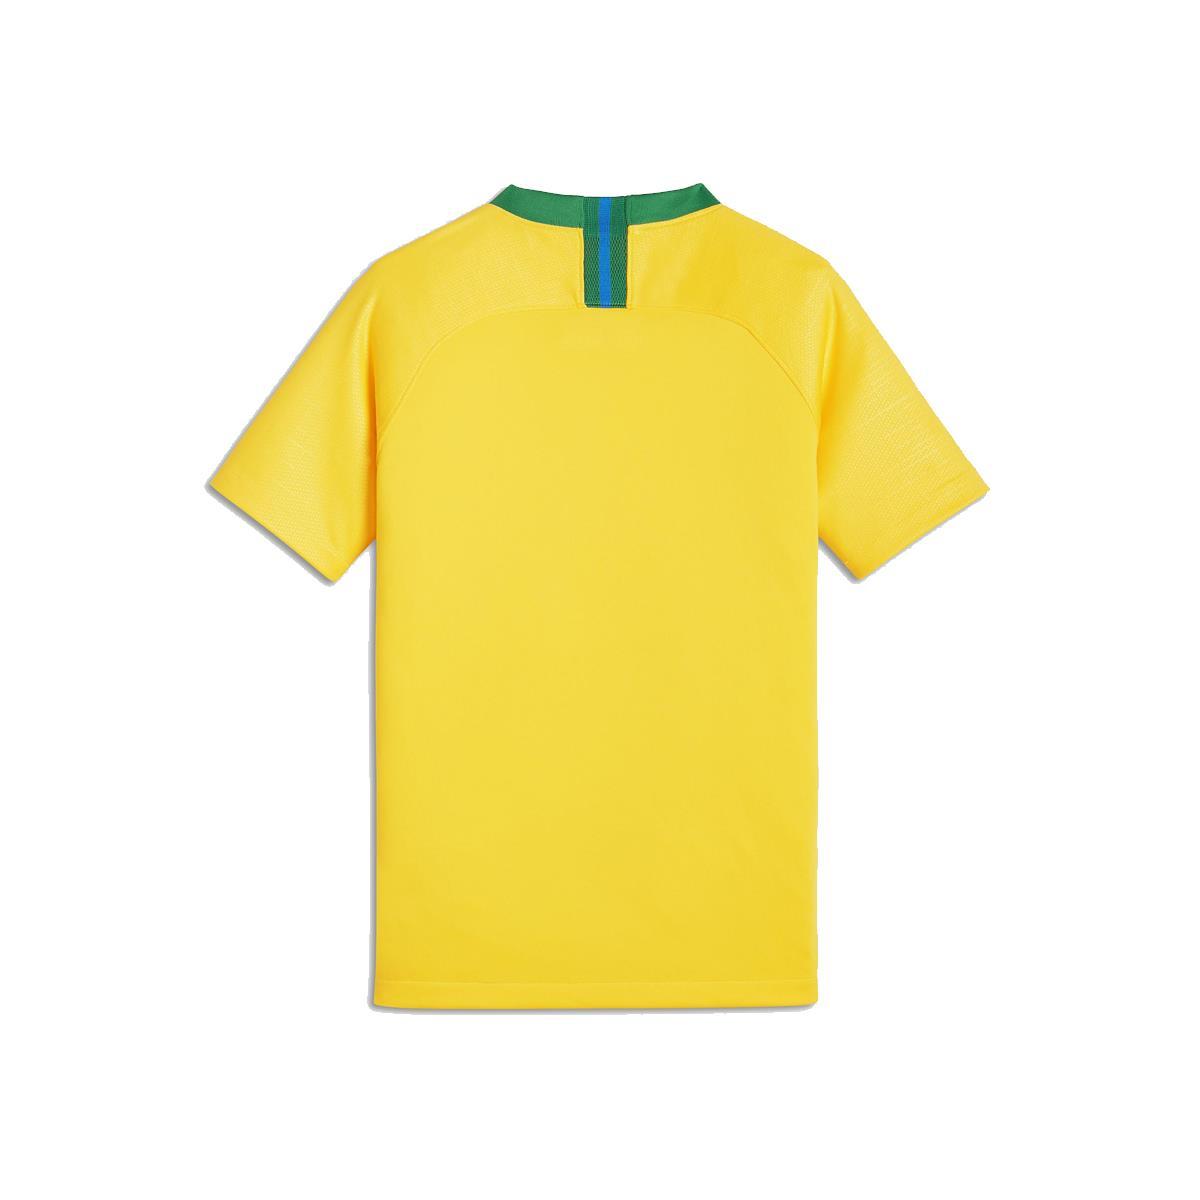 637aef9b6 Camisa Nike Brasil 2018 19 Torcedor Réplica Infantil